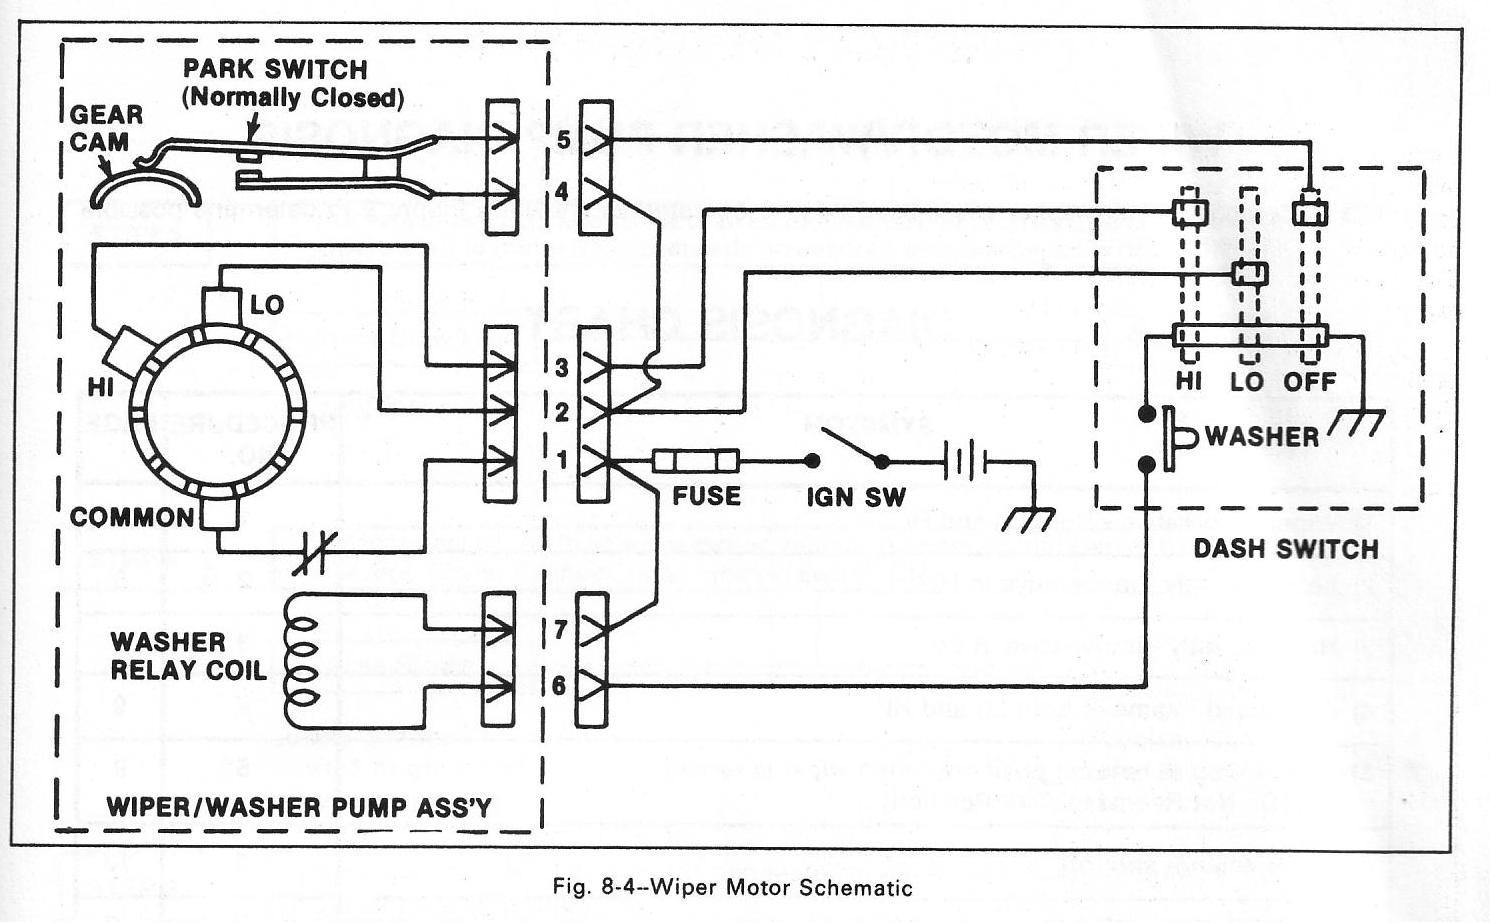 1978ChevyWiperDiagram1 bytes